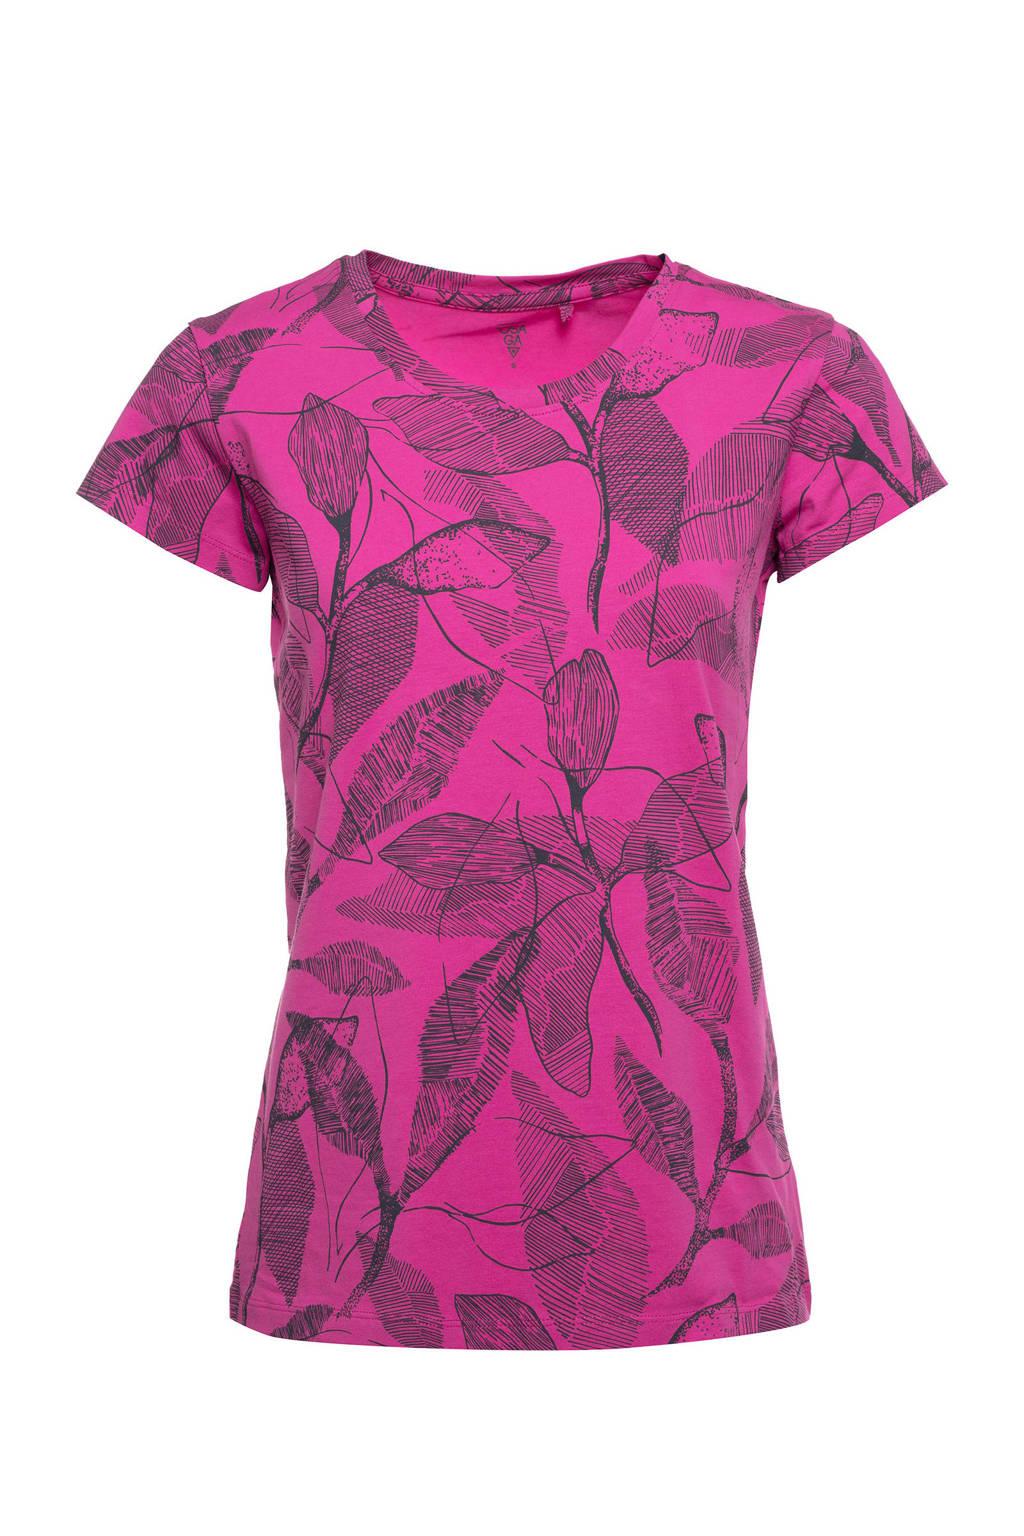 Scapino Osaga sport T-shirt roze/grijs, Roze/grijs